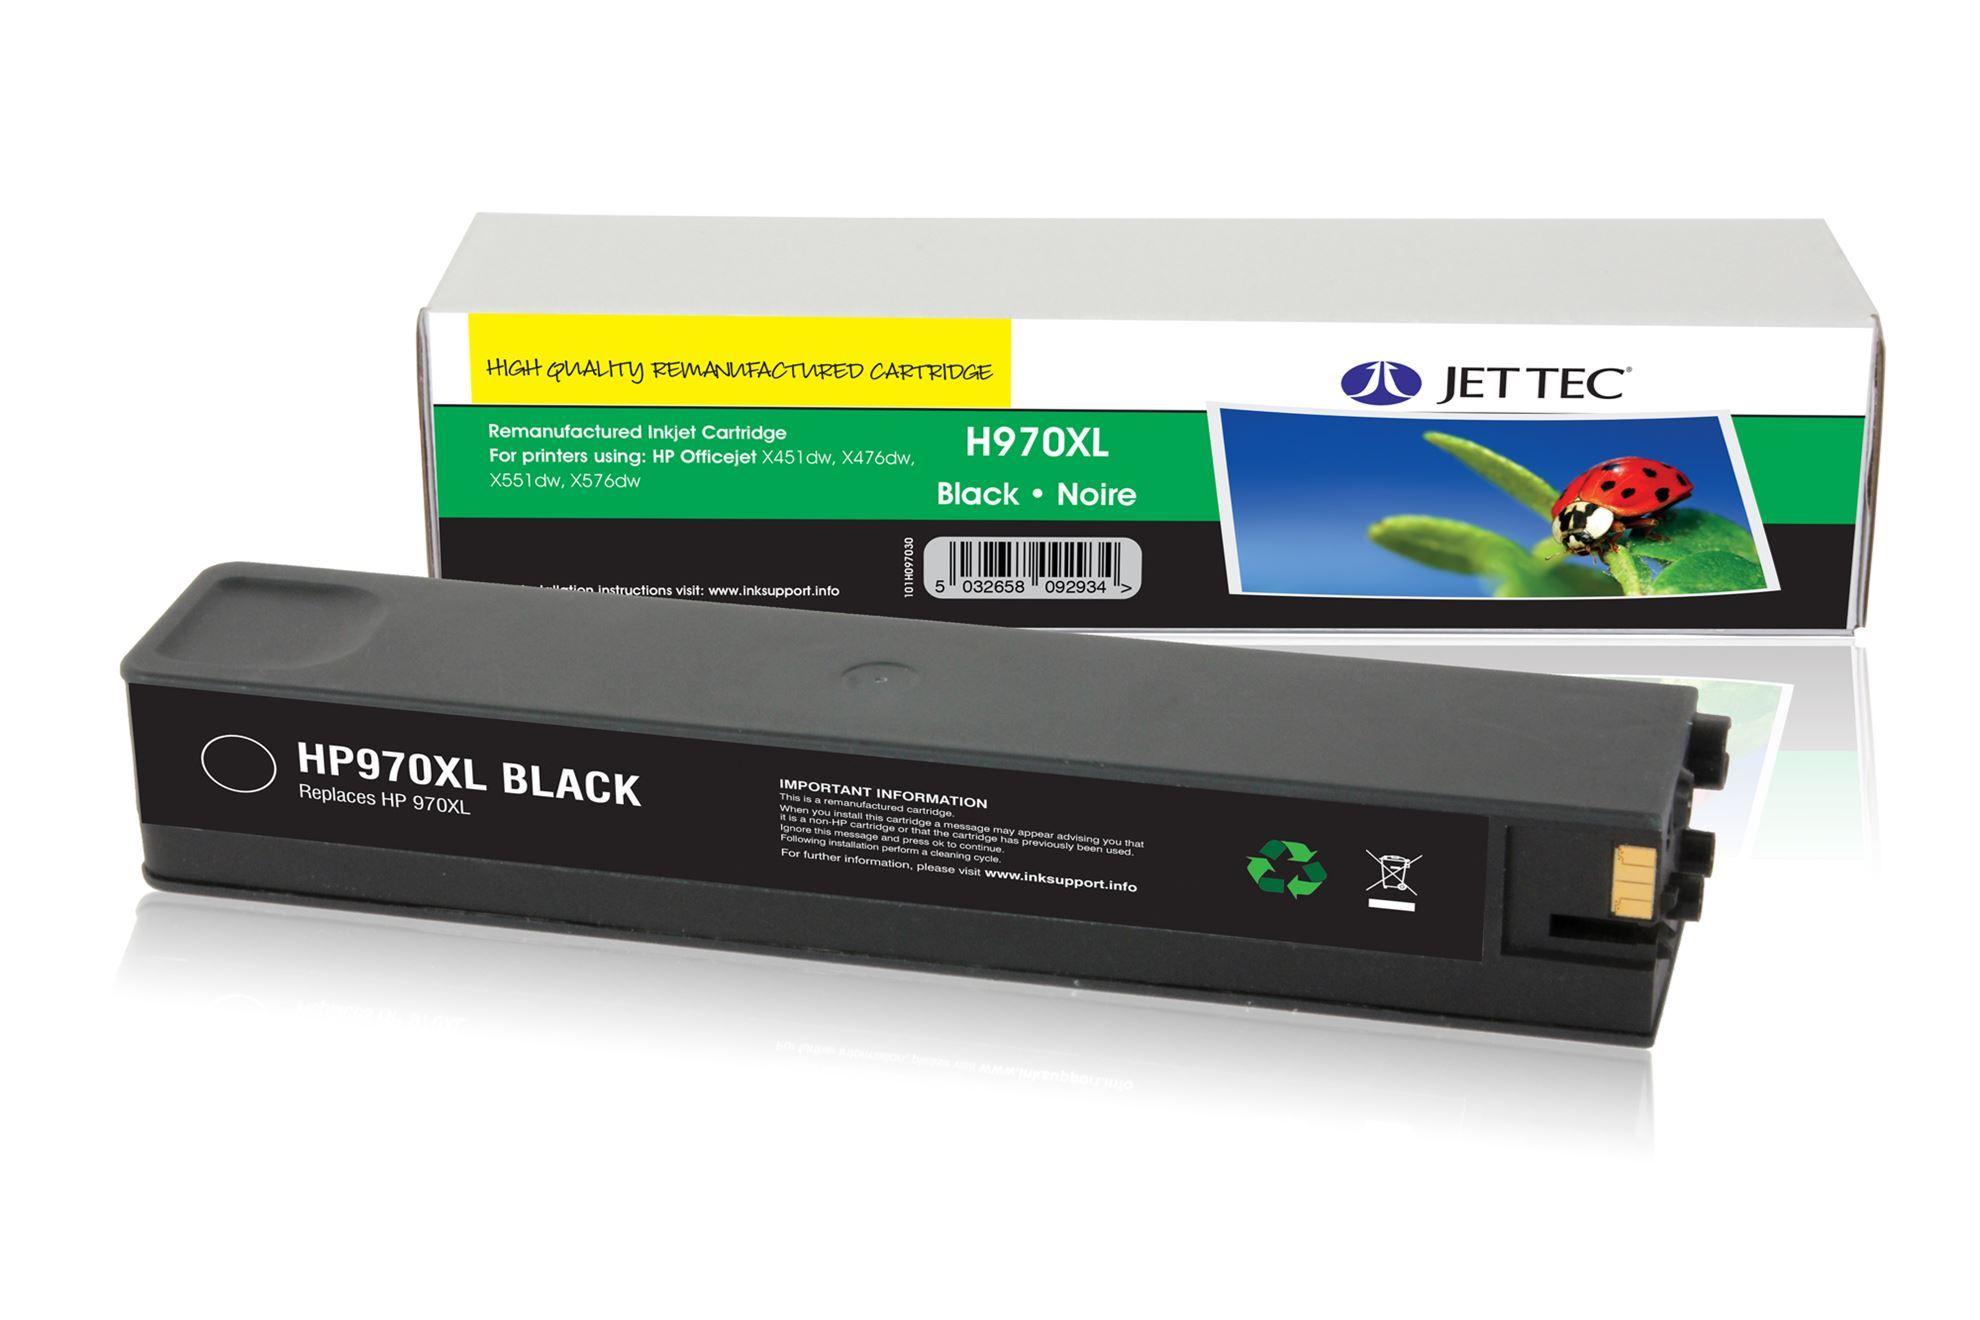 HP970XL Black